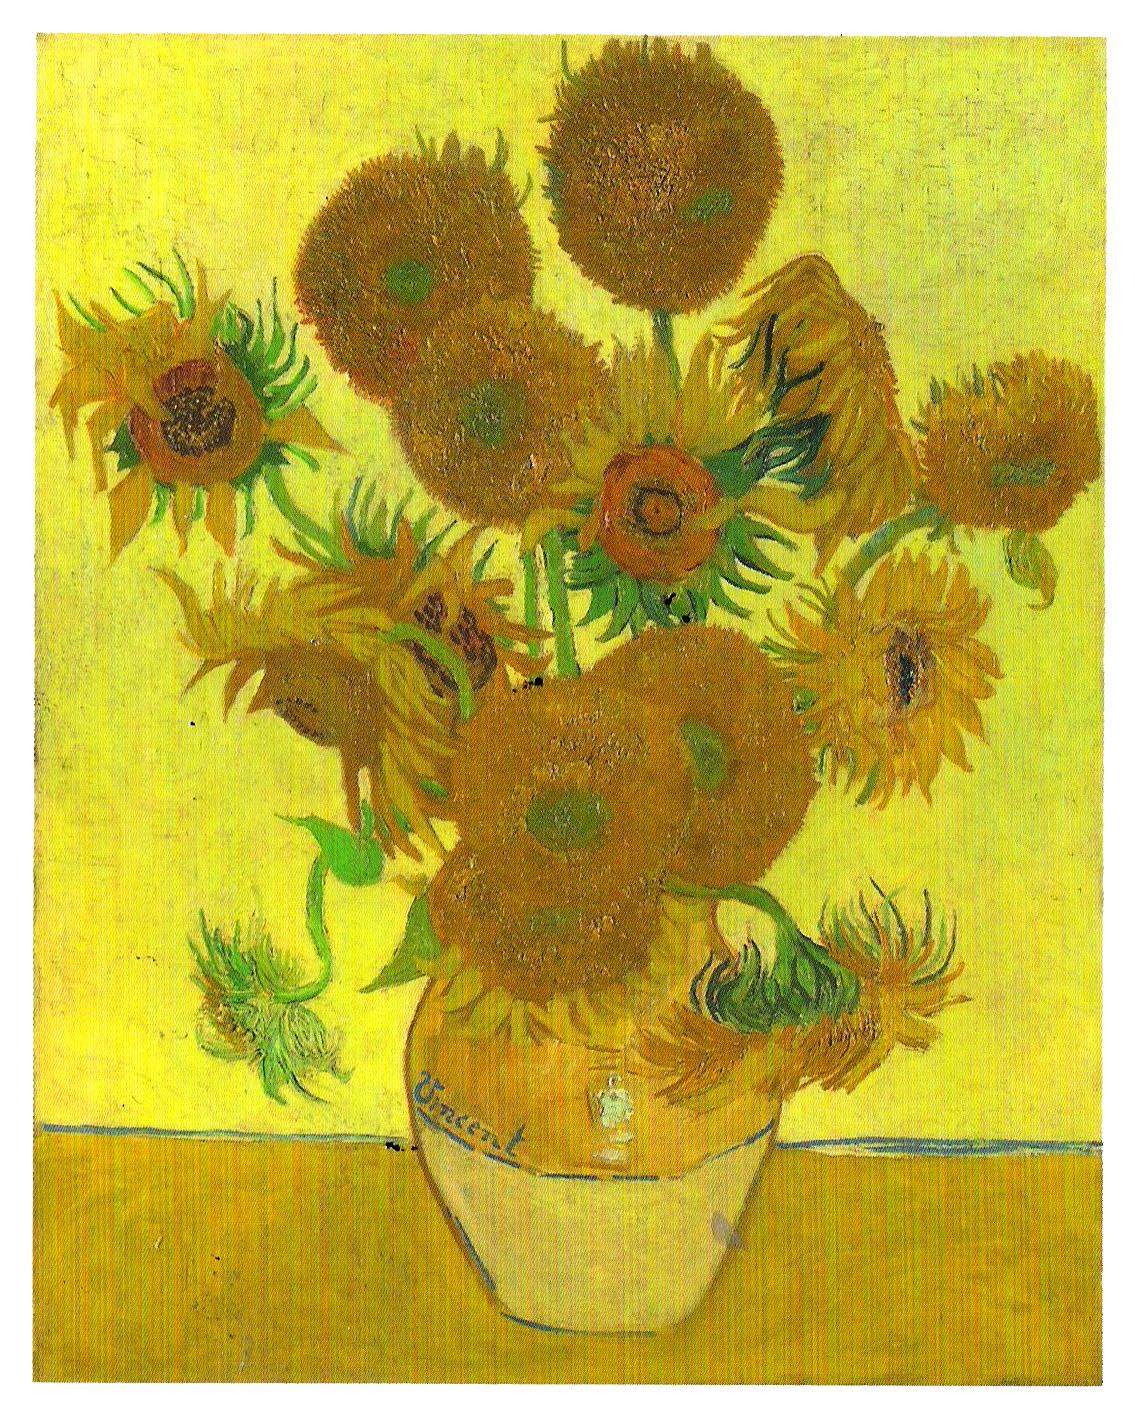 Van Gogh Wallpaper: All Best Picos: Vincent Van Gogh Wallpapers, Painting